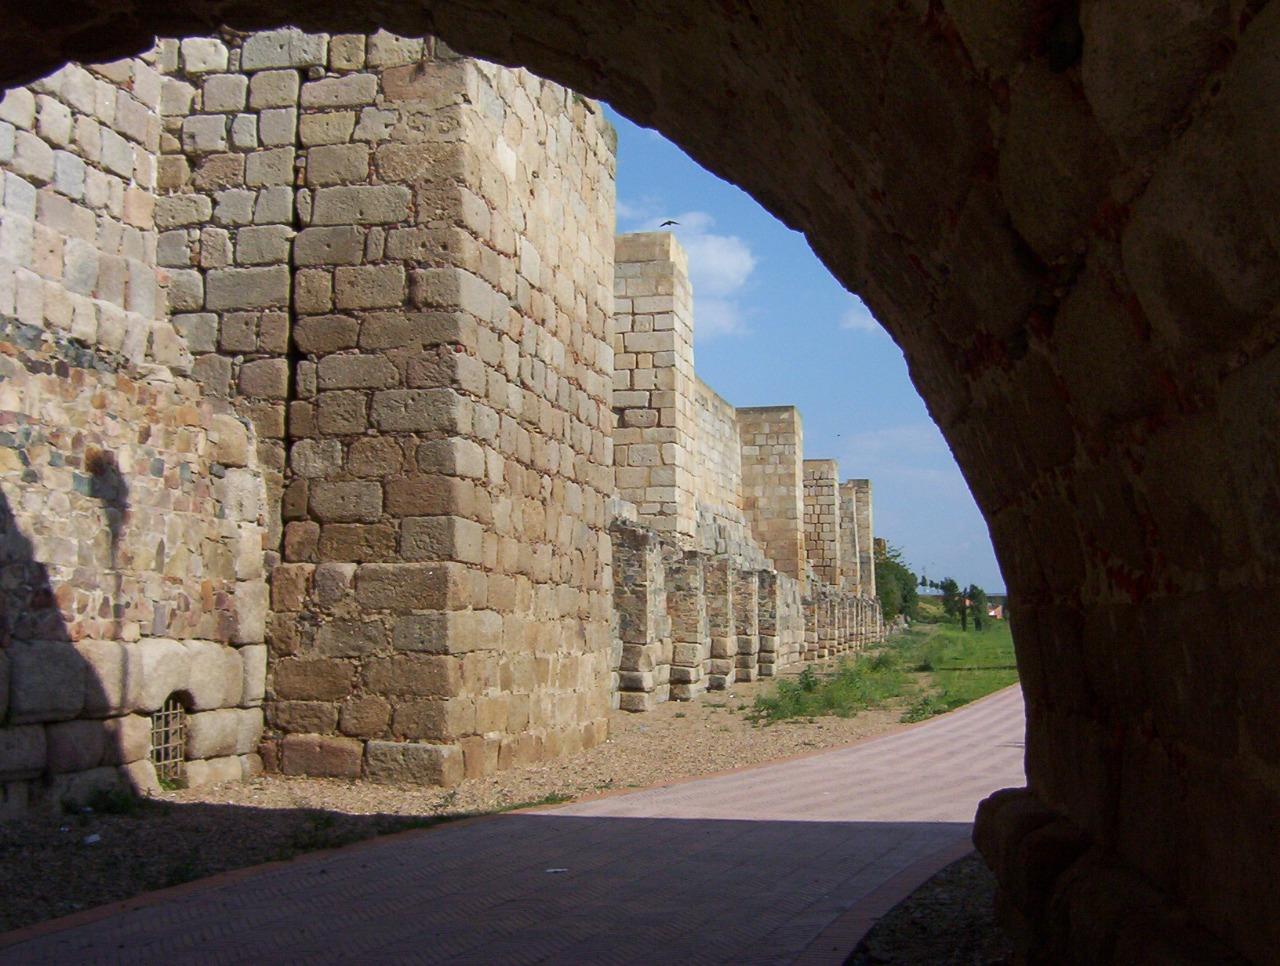 muralla alcazaba arabe en merida